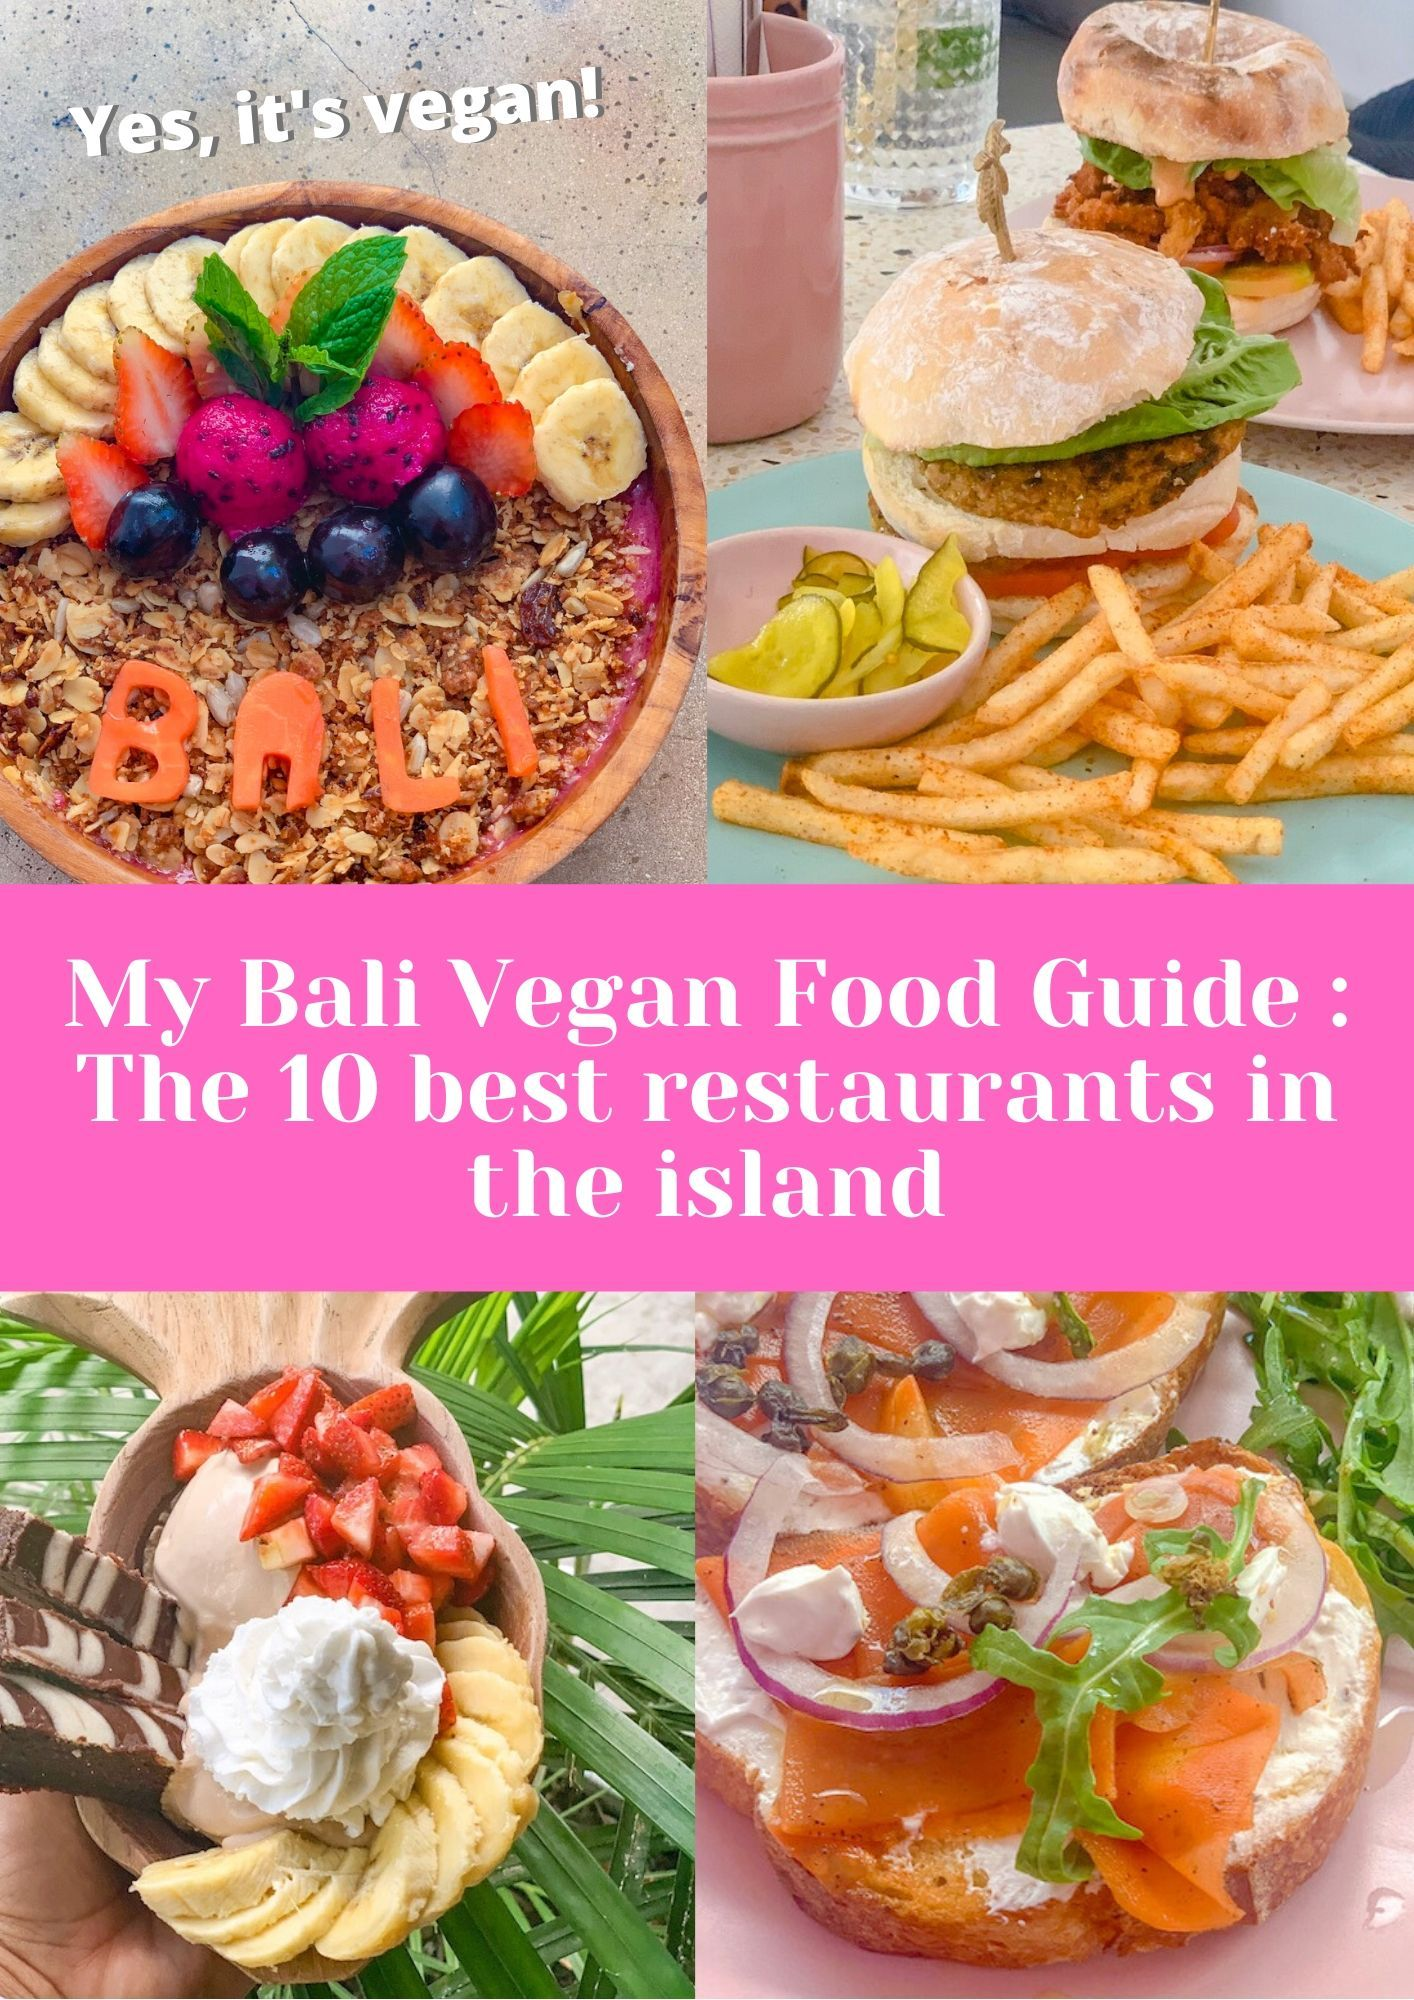 My Bali Vegan Food Guide The 10 Best Restaurants In The Island In 2020 Food Guide Food Vegan Travel